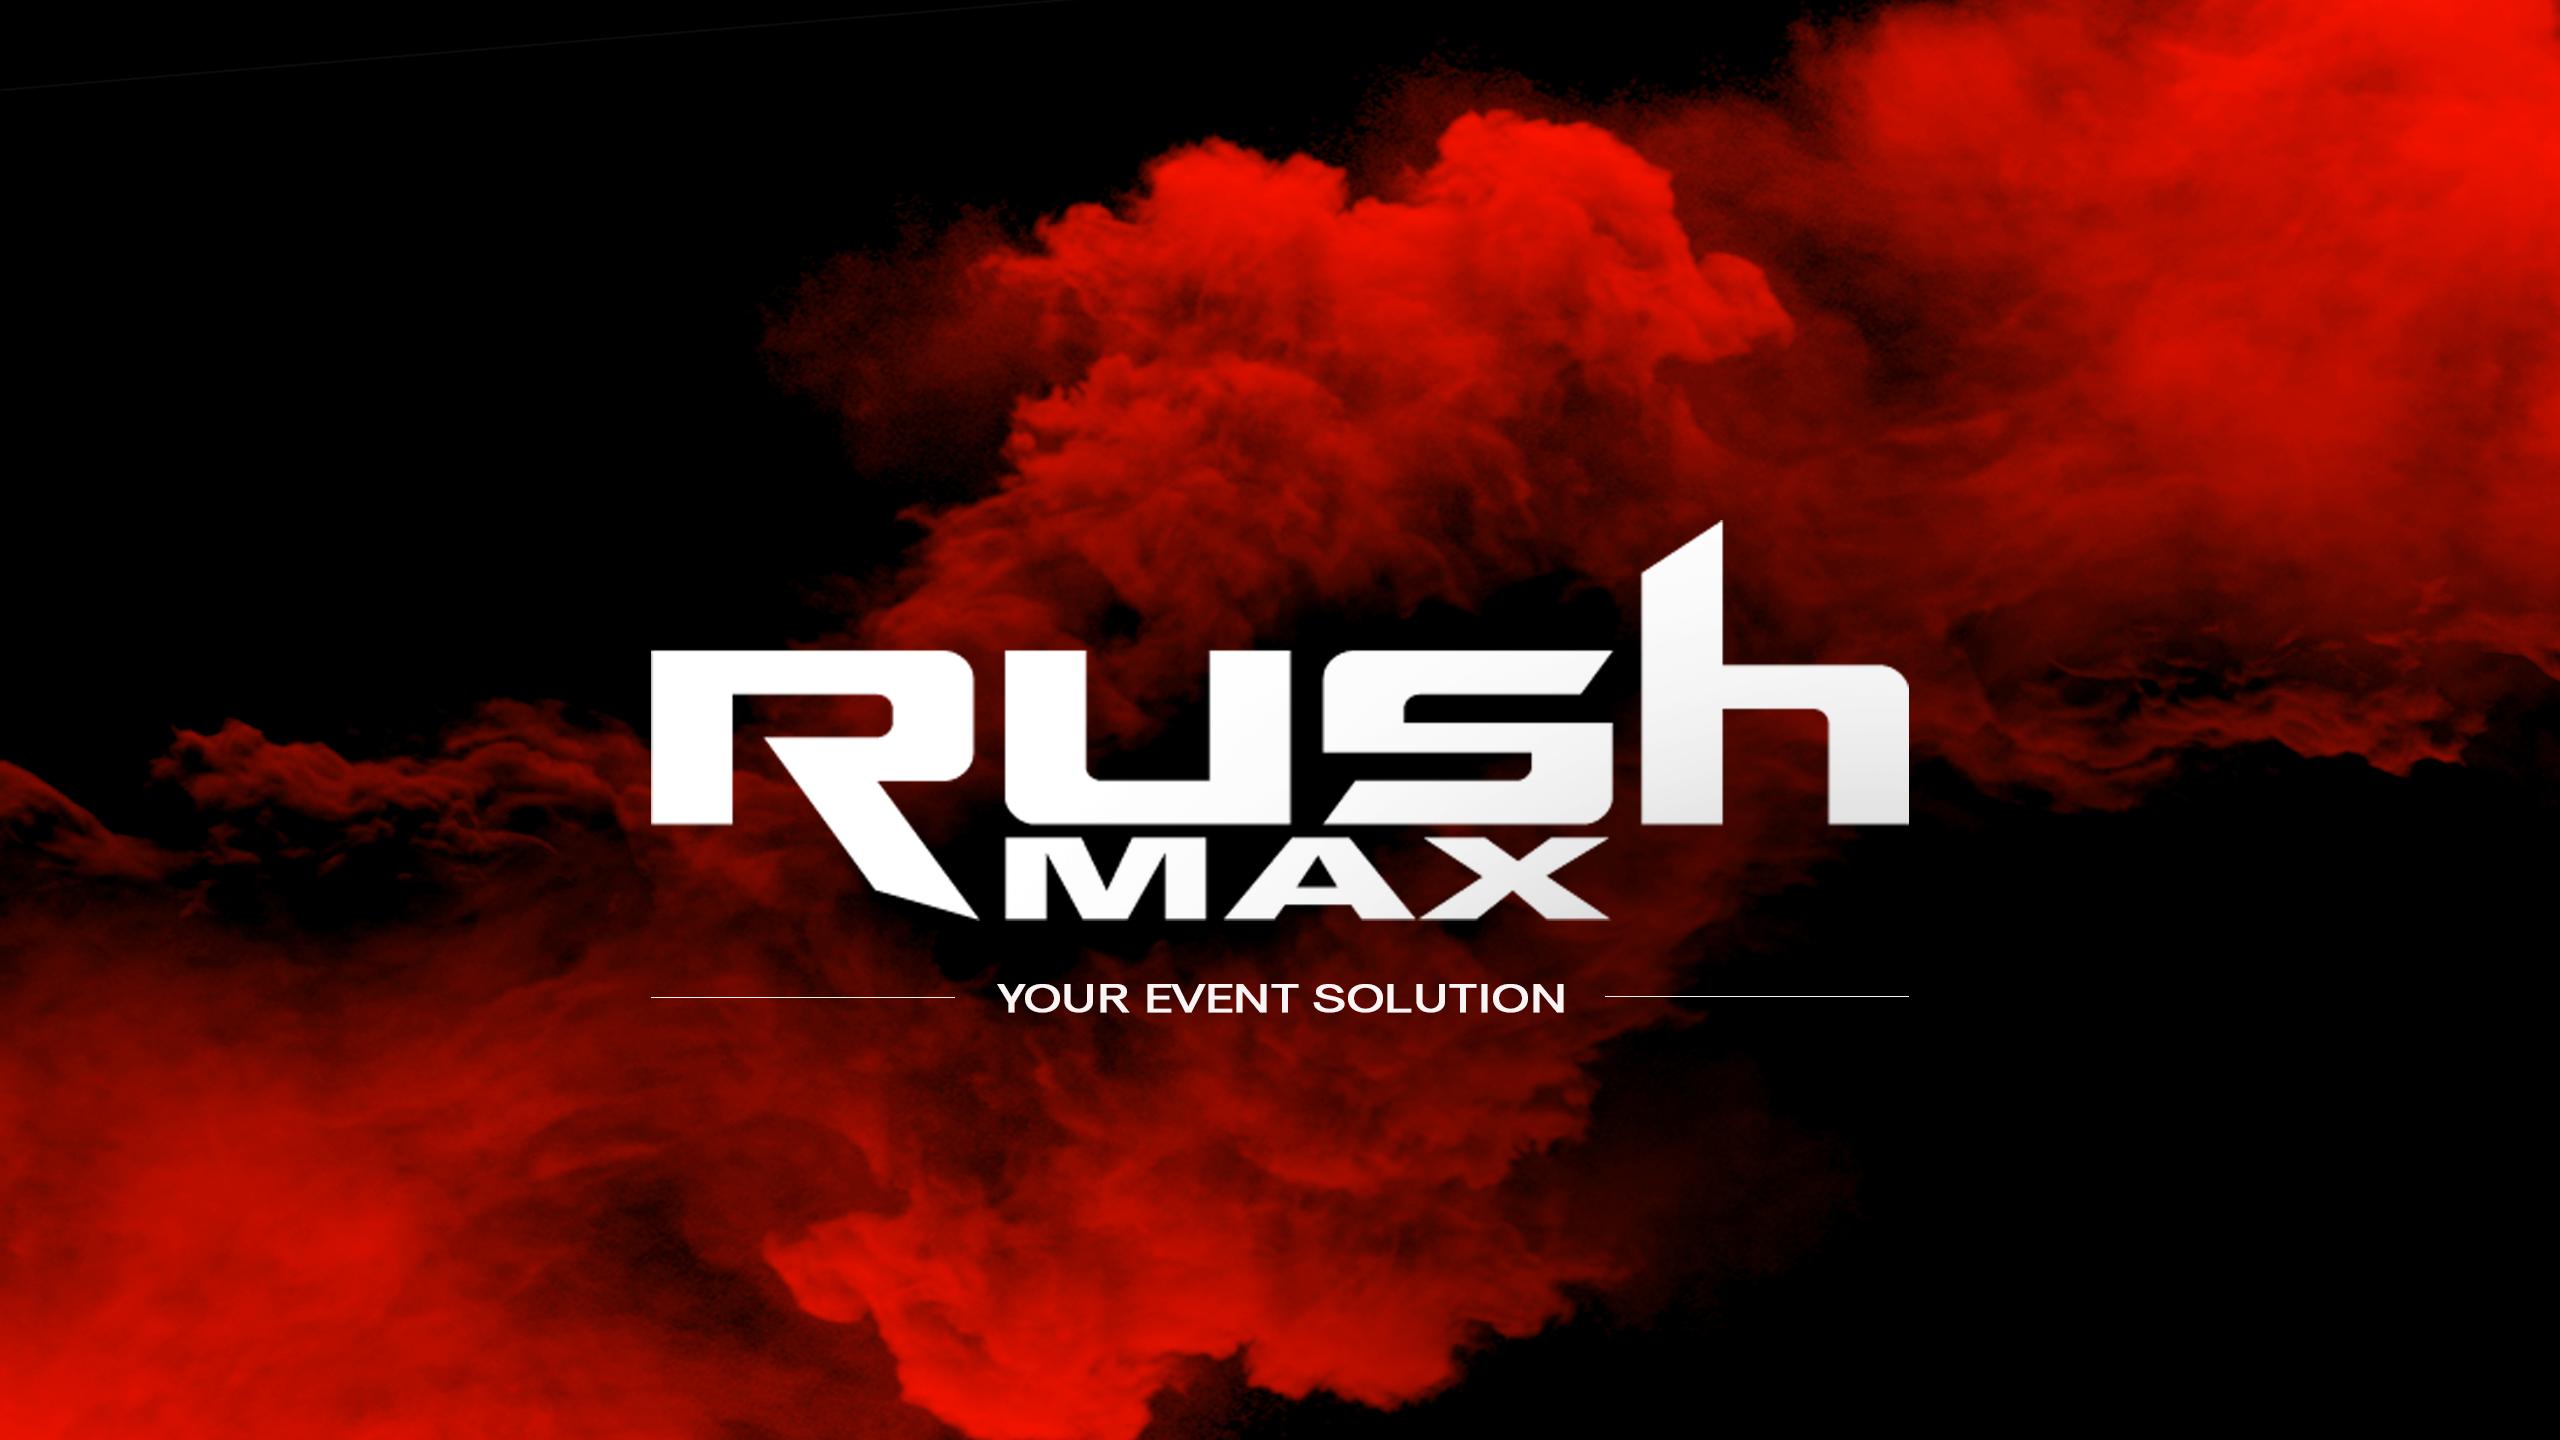 Rush Max Event